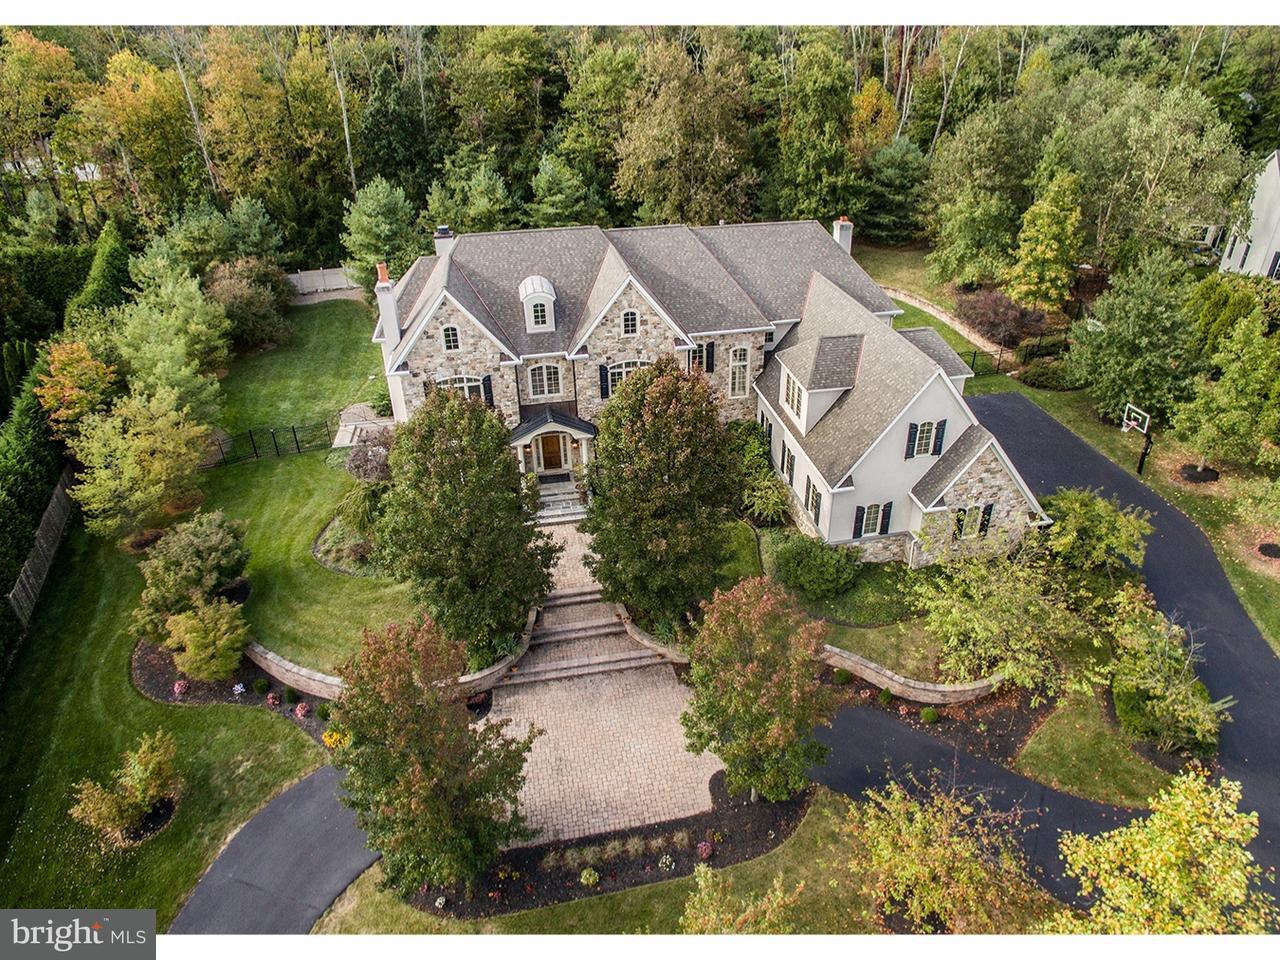 Single Family Home for Sale at 861 S PENN OAK Road Ambler, Pennsylvania 19002 United States